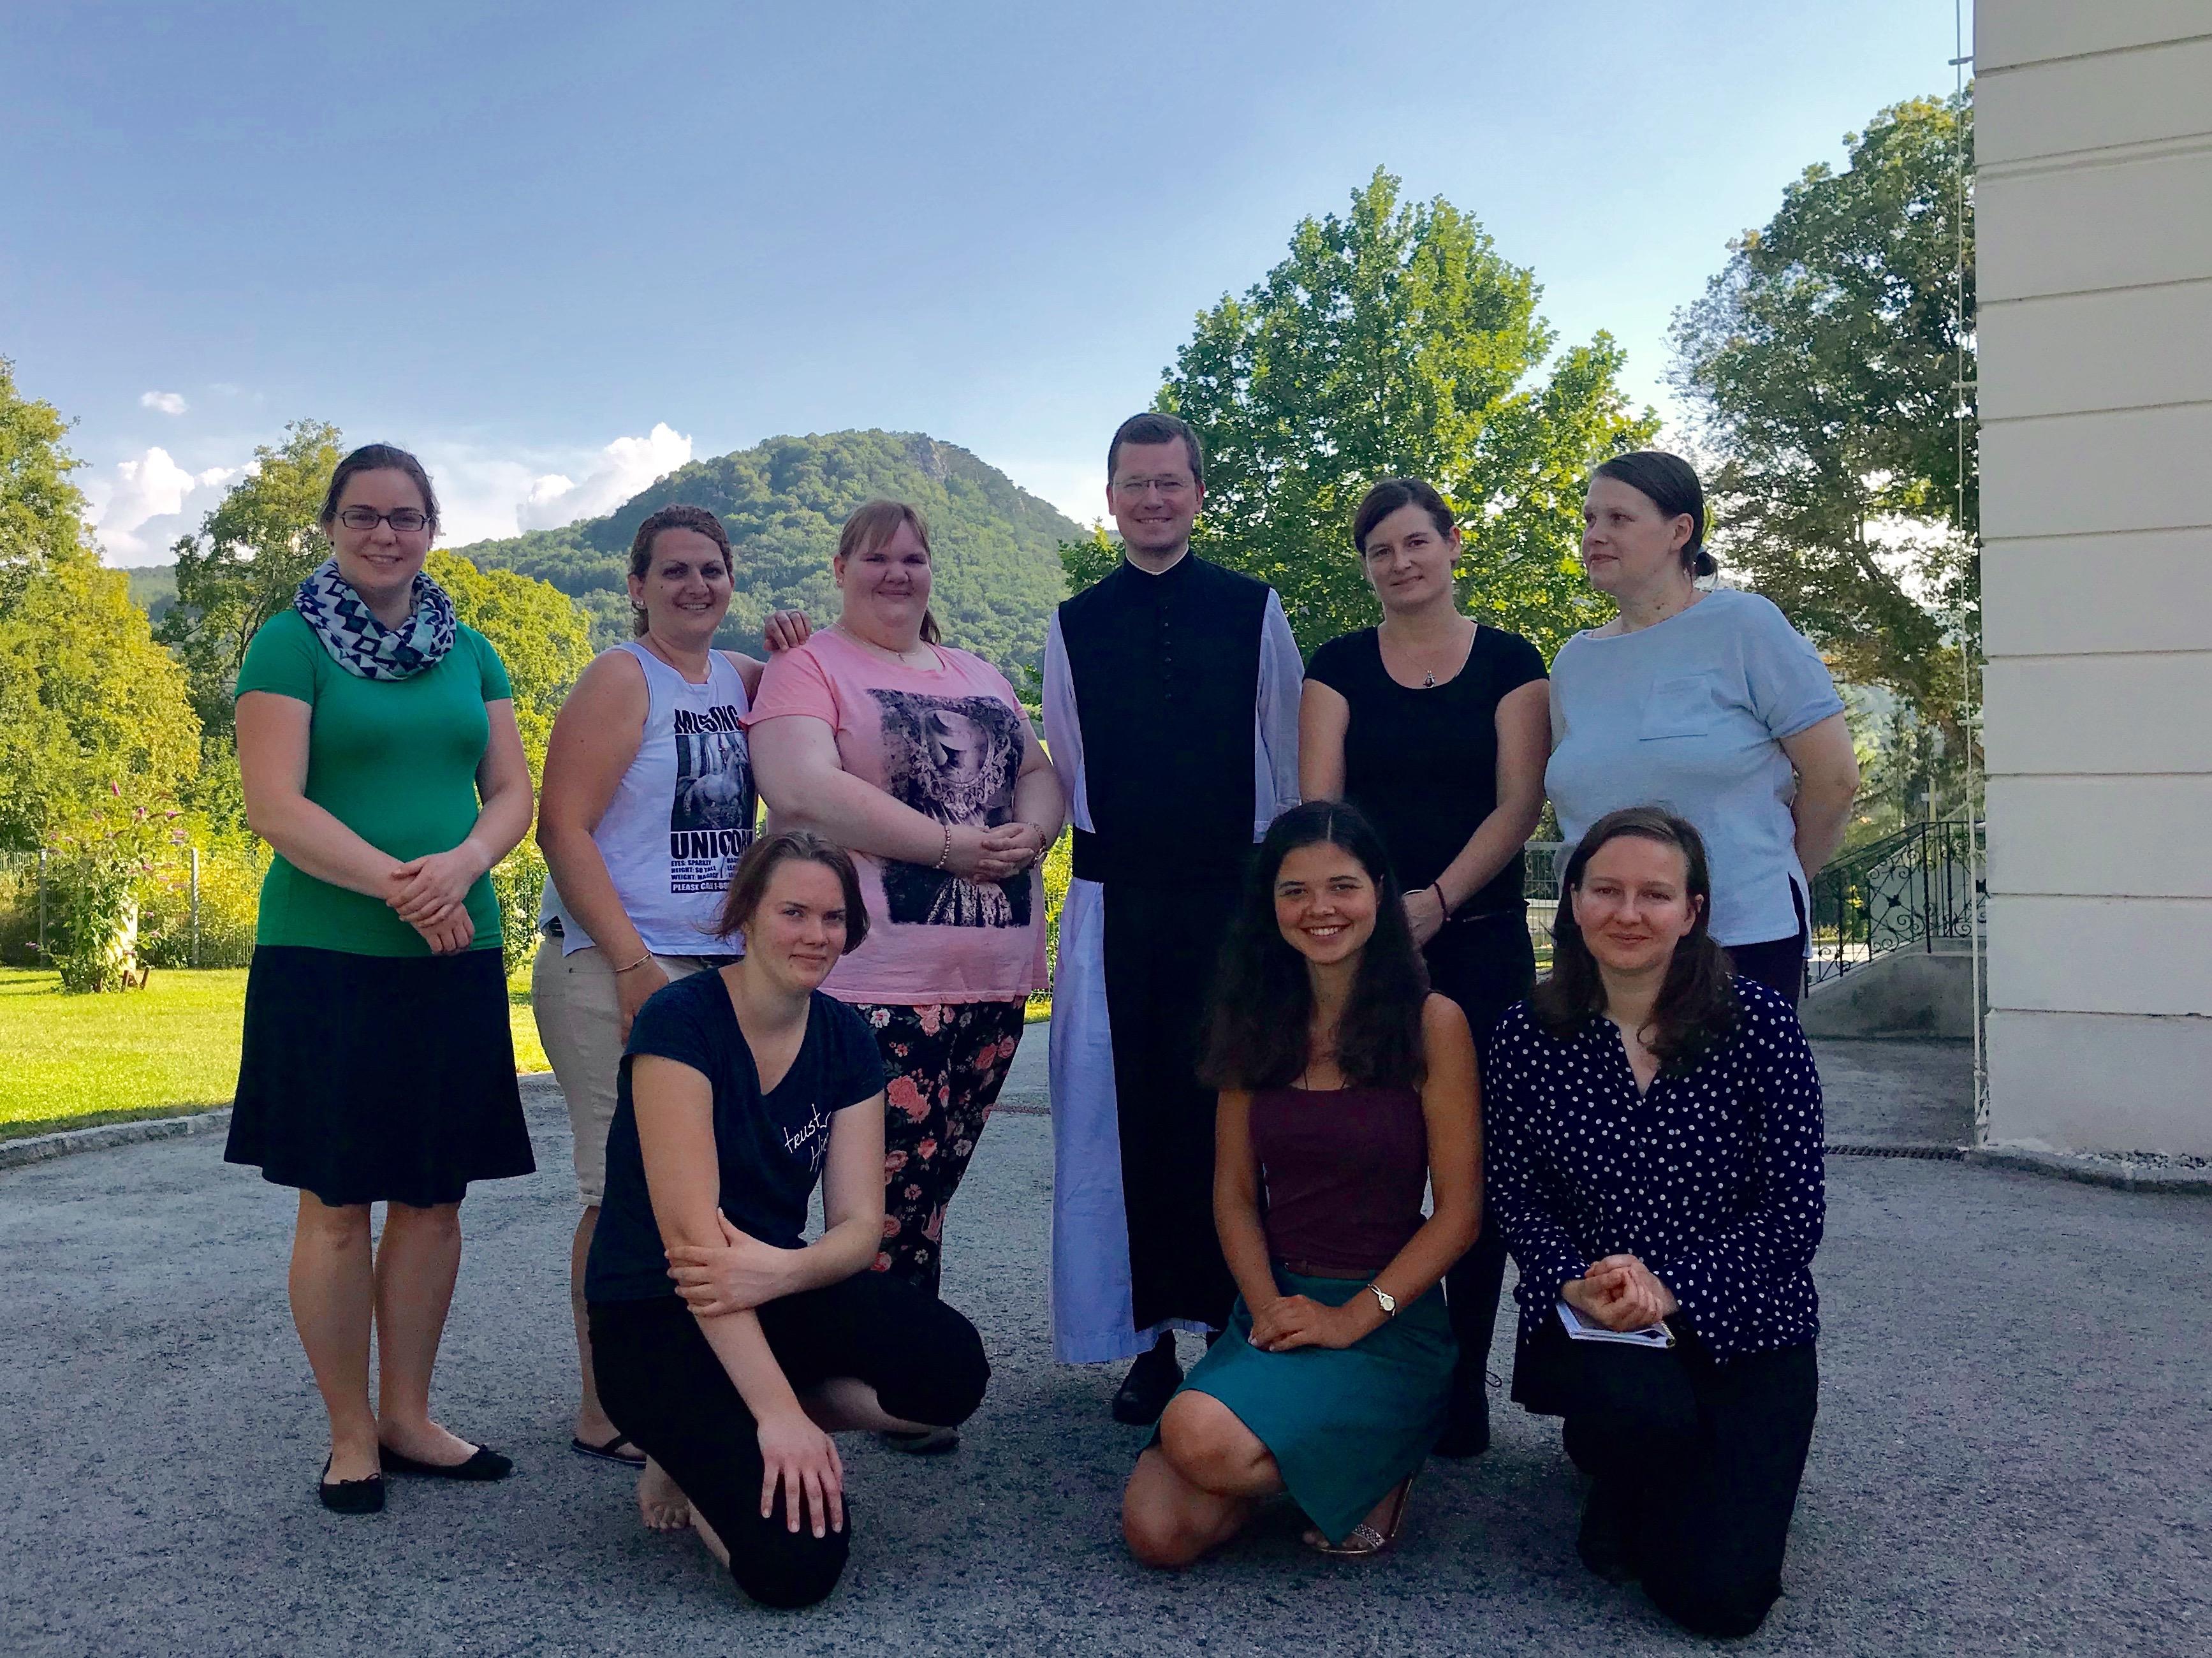 Kloster Exerzitien Frauen